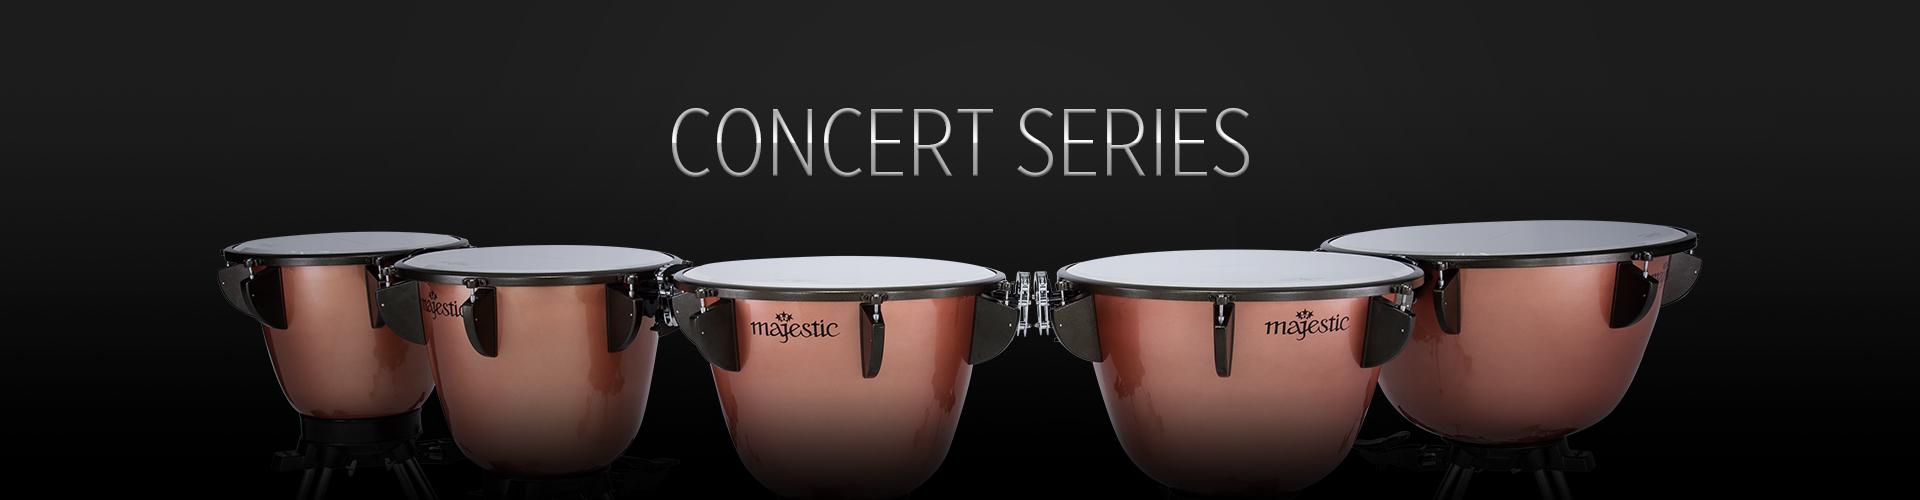 Concert Series Timpani KV1